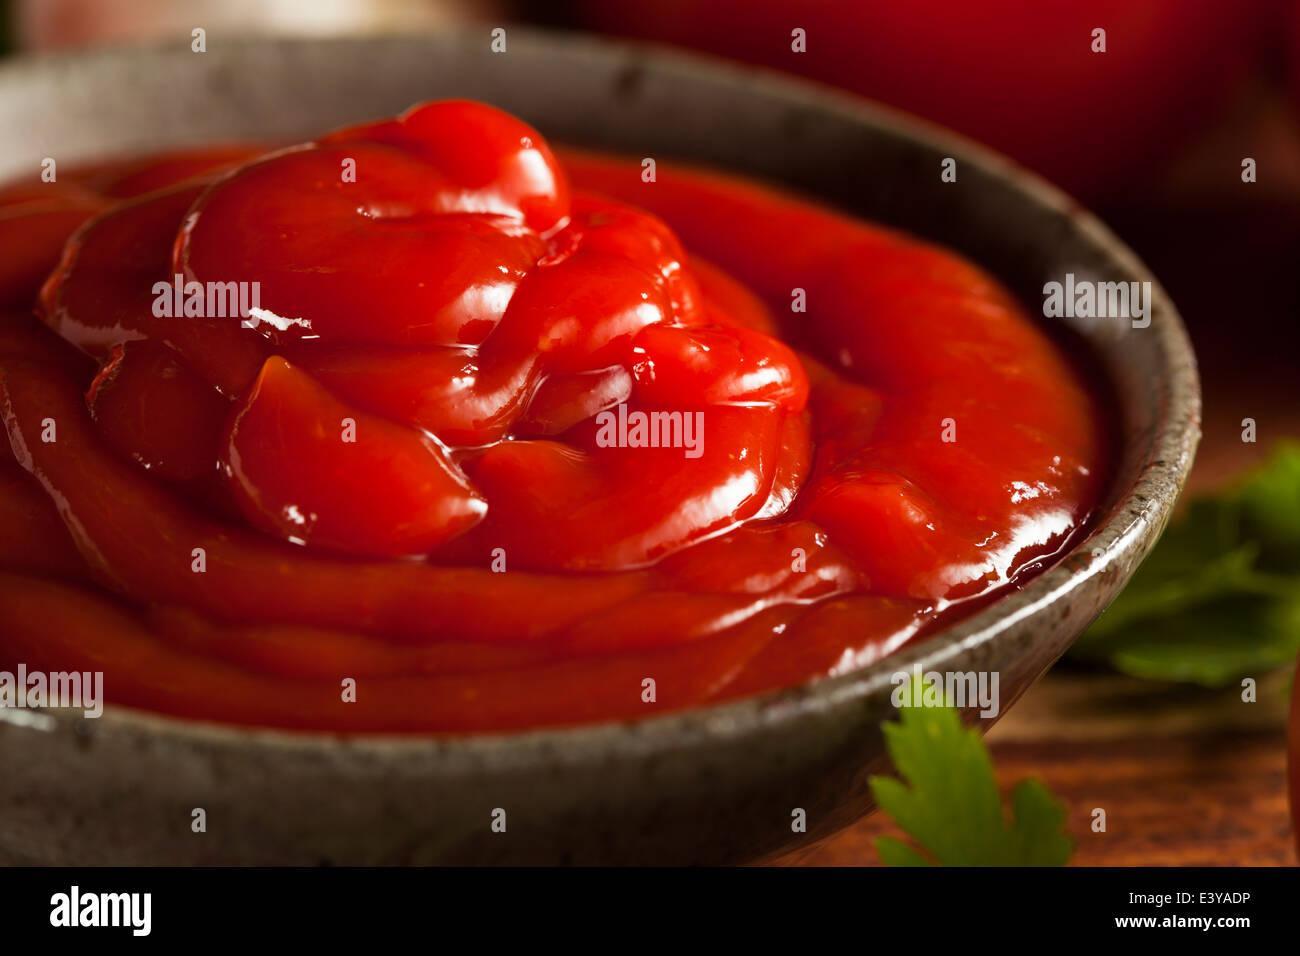 bottle tomato ketchup stockfotos bottle tomato ketchup bilder alamy. Black Bedroom Furniture Sets. Home Design Ideas